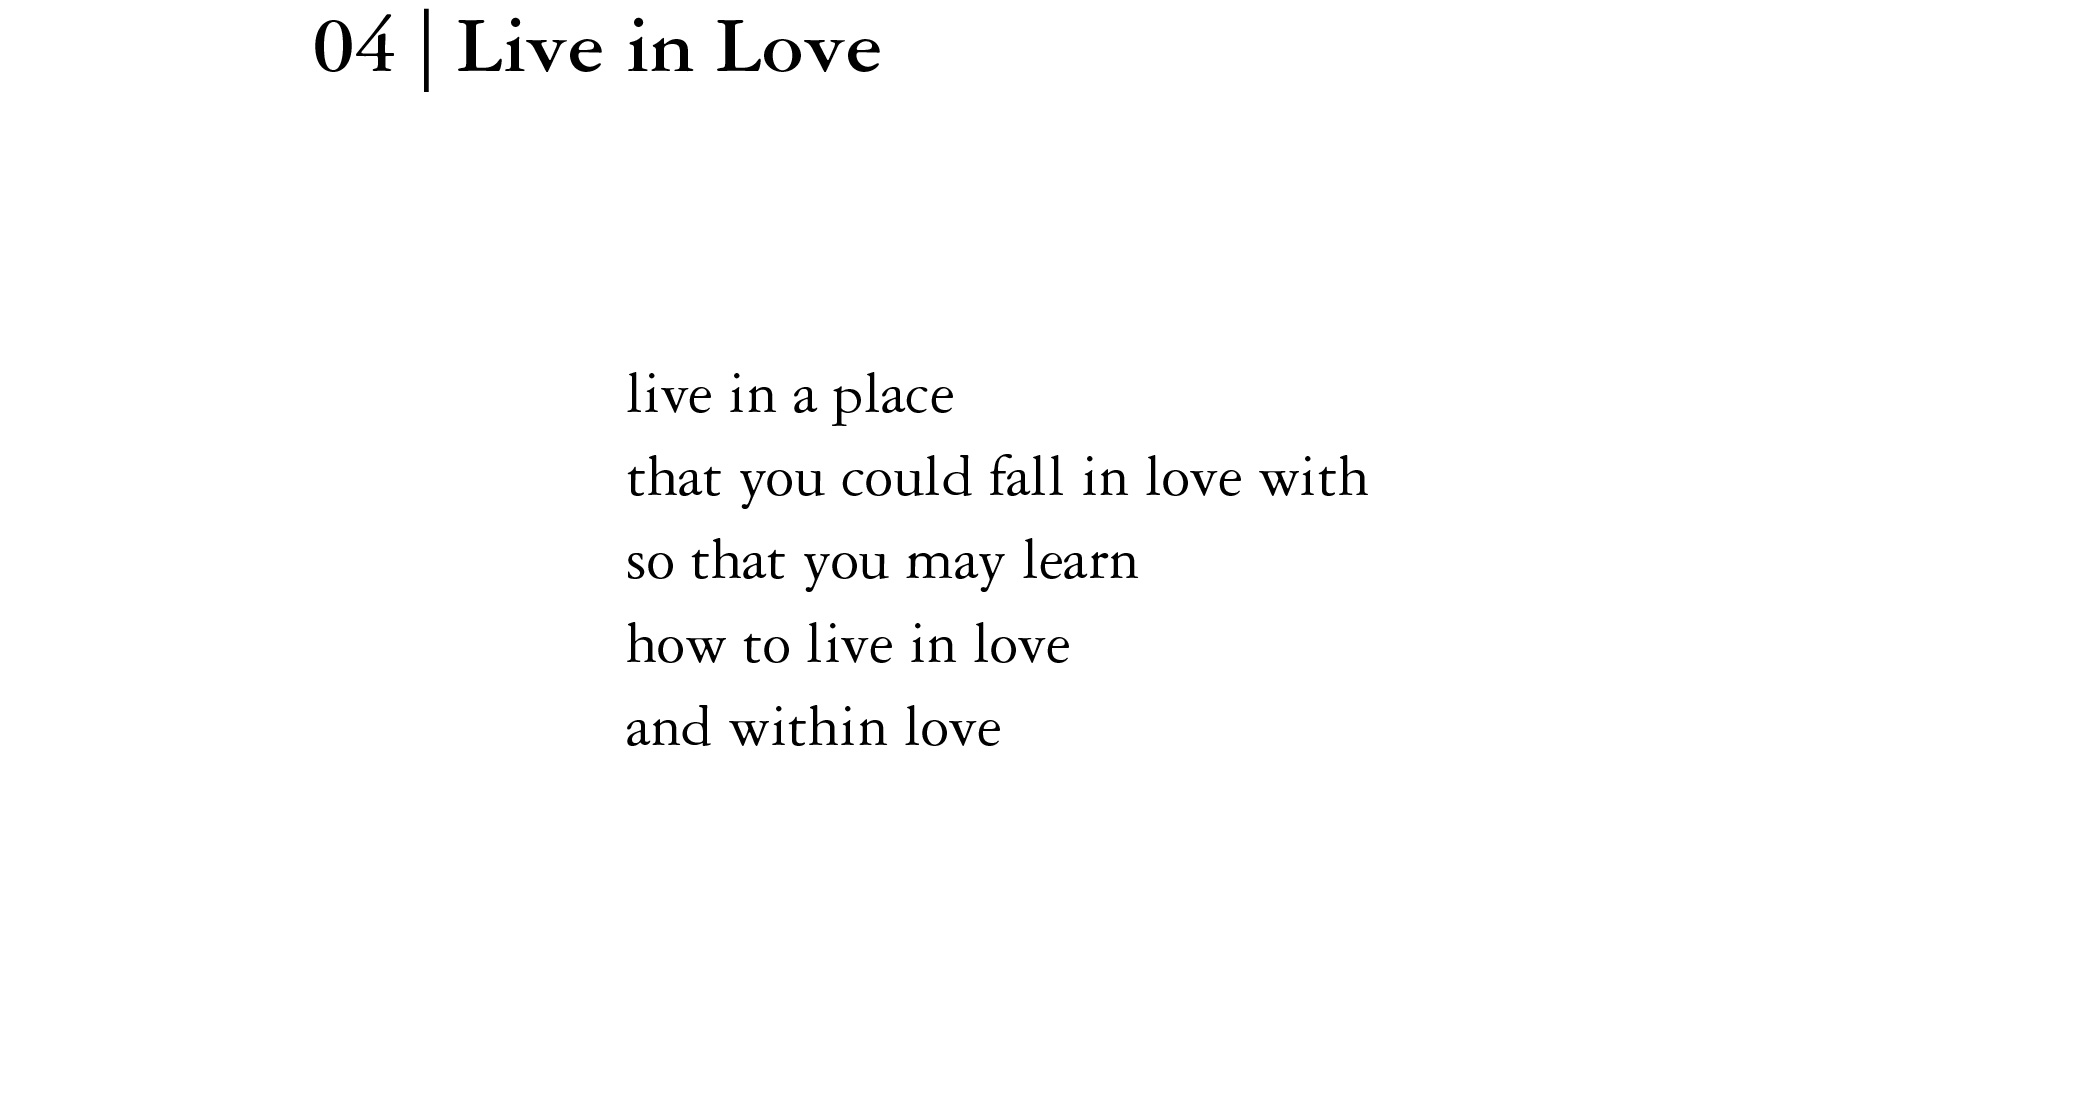 tong oi poems-04.jpg